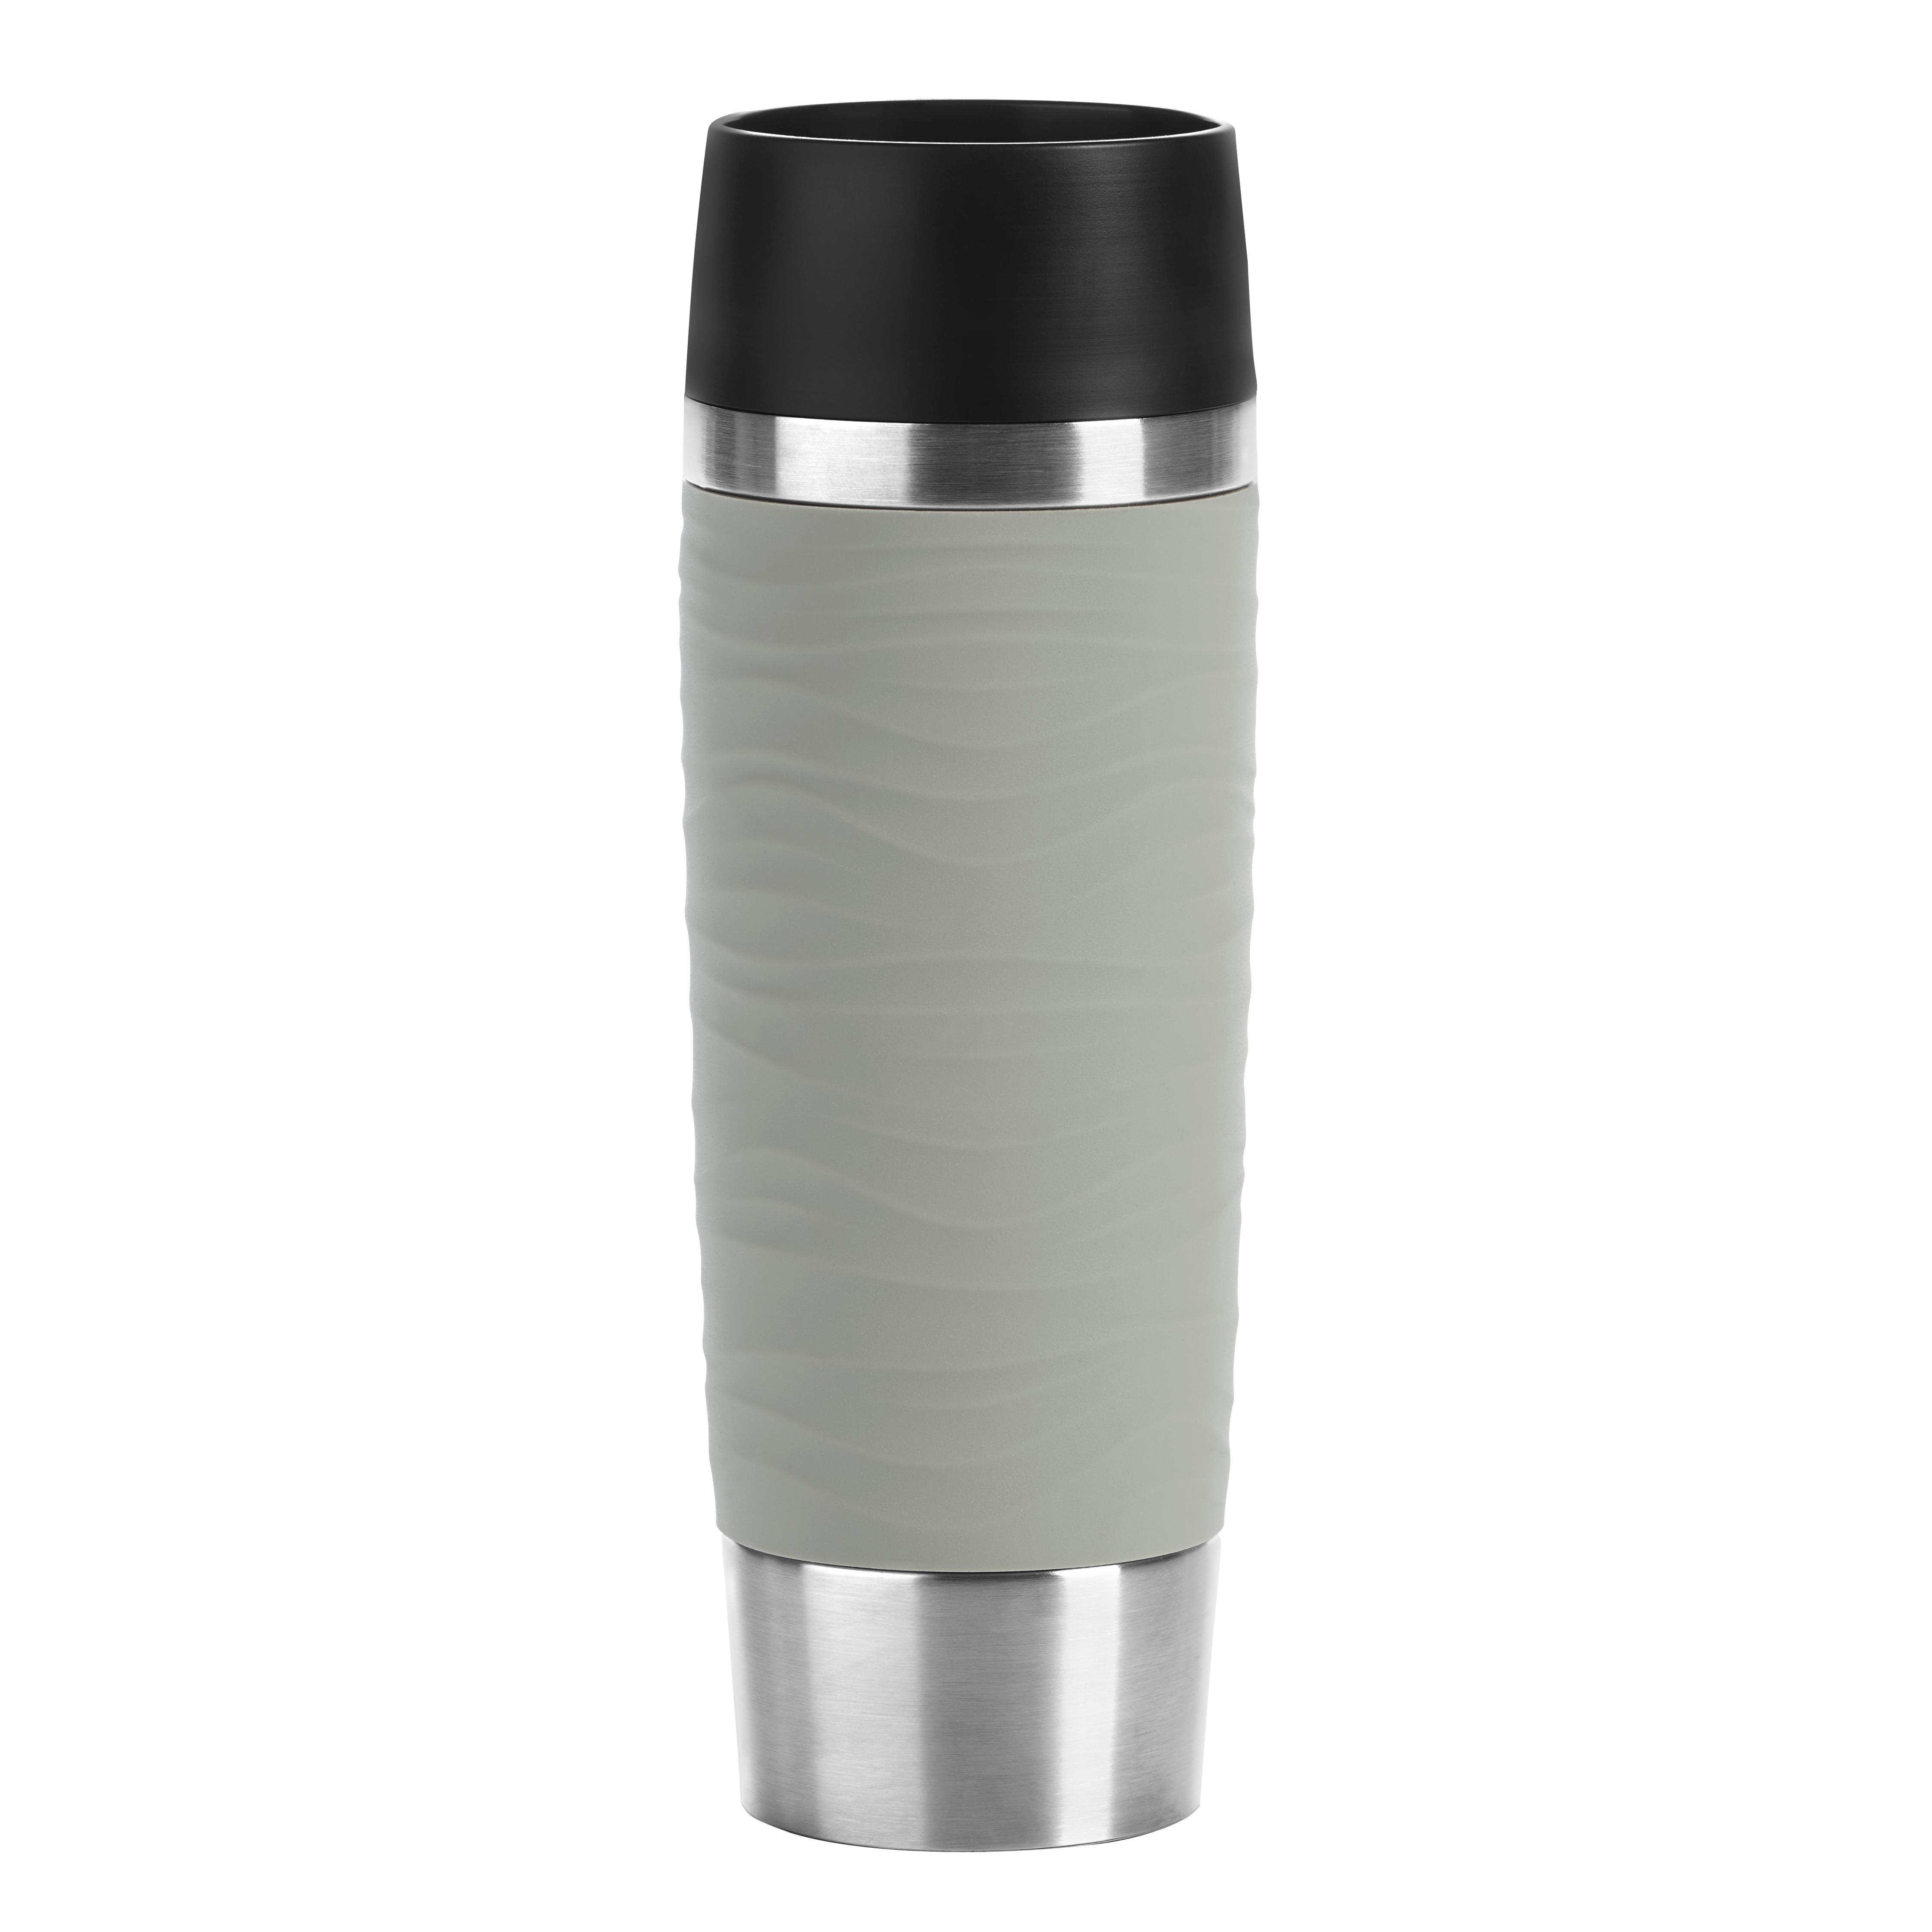 EMSA N2012200 TRAVEL MUG WAVES GRANDE Isolierbecher 0,5 L Edelstahl/Pudergrau Quick-Press-Verschluss – 100 % dicht - 6 h heiß/ 12 h kalt - spülmaschinenfest - To-go-Becher im XXL-Format